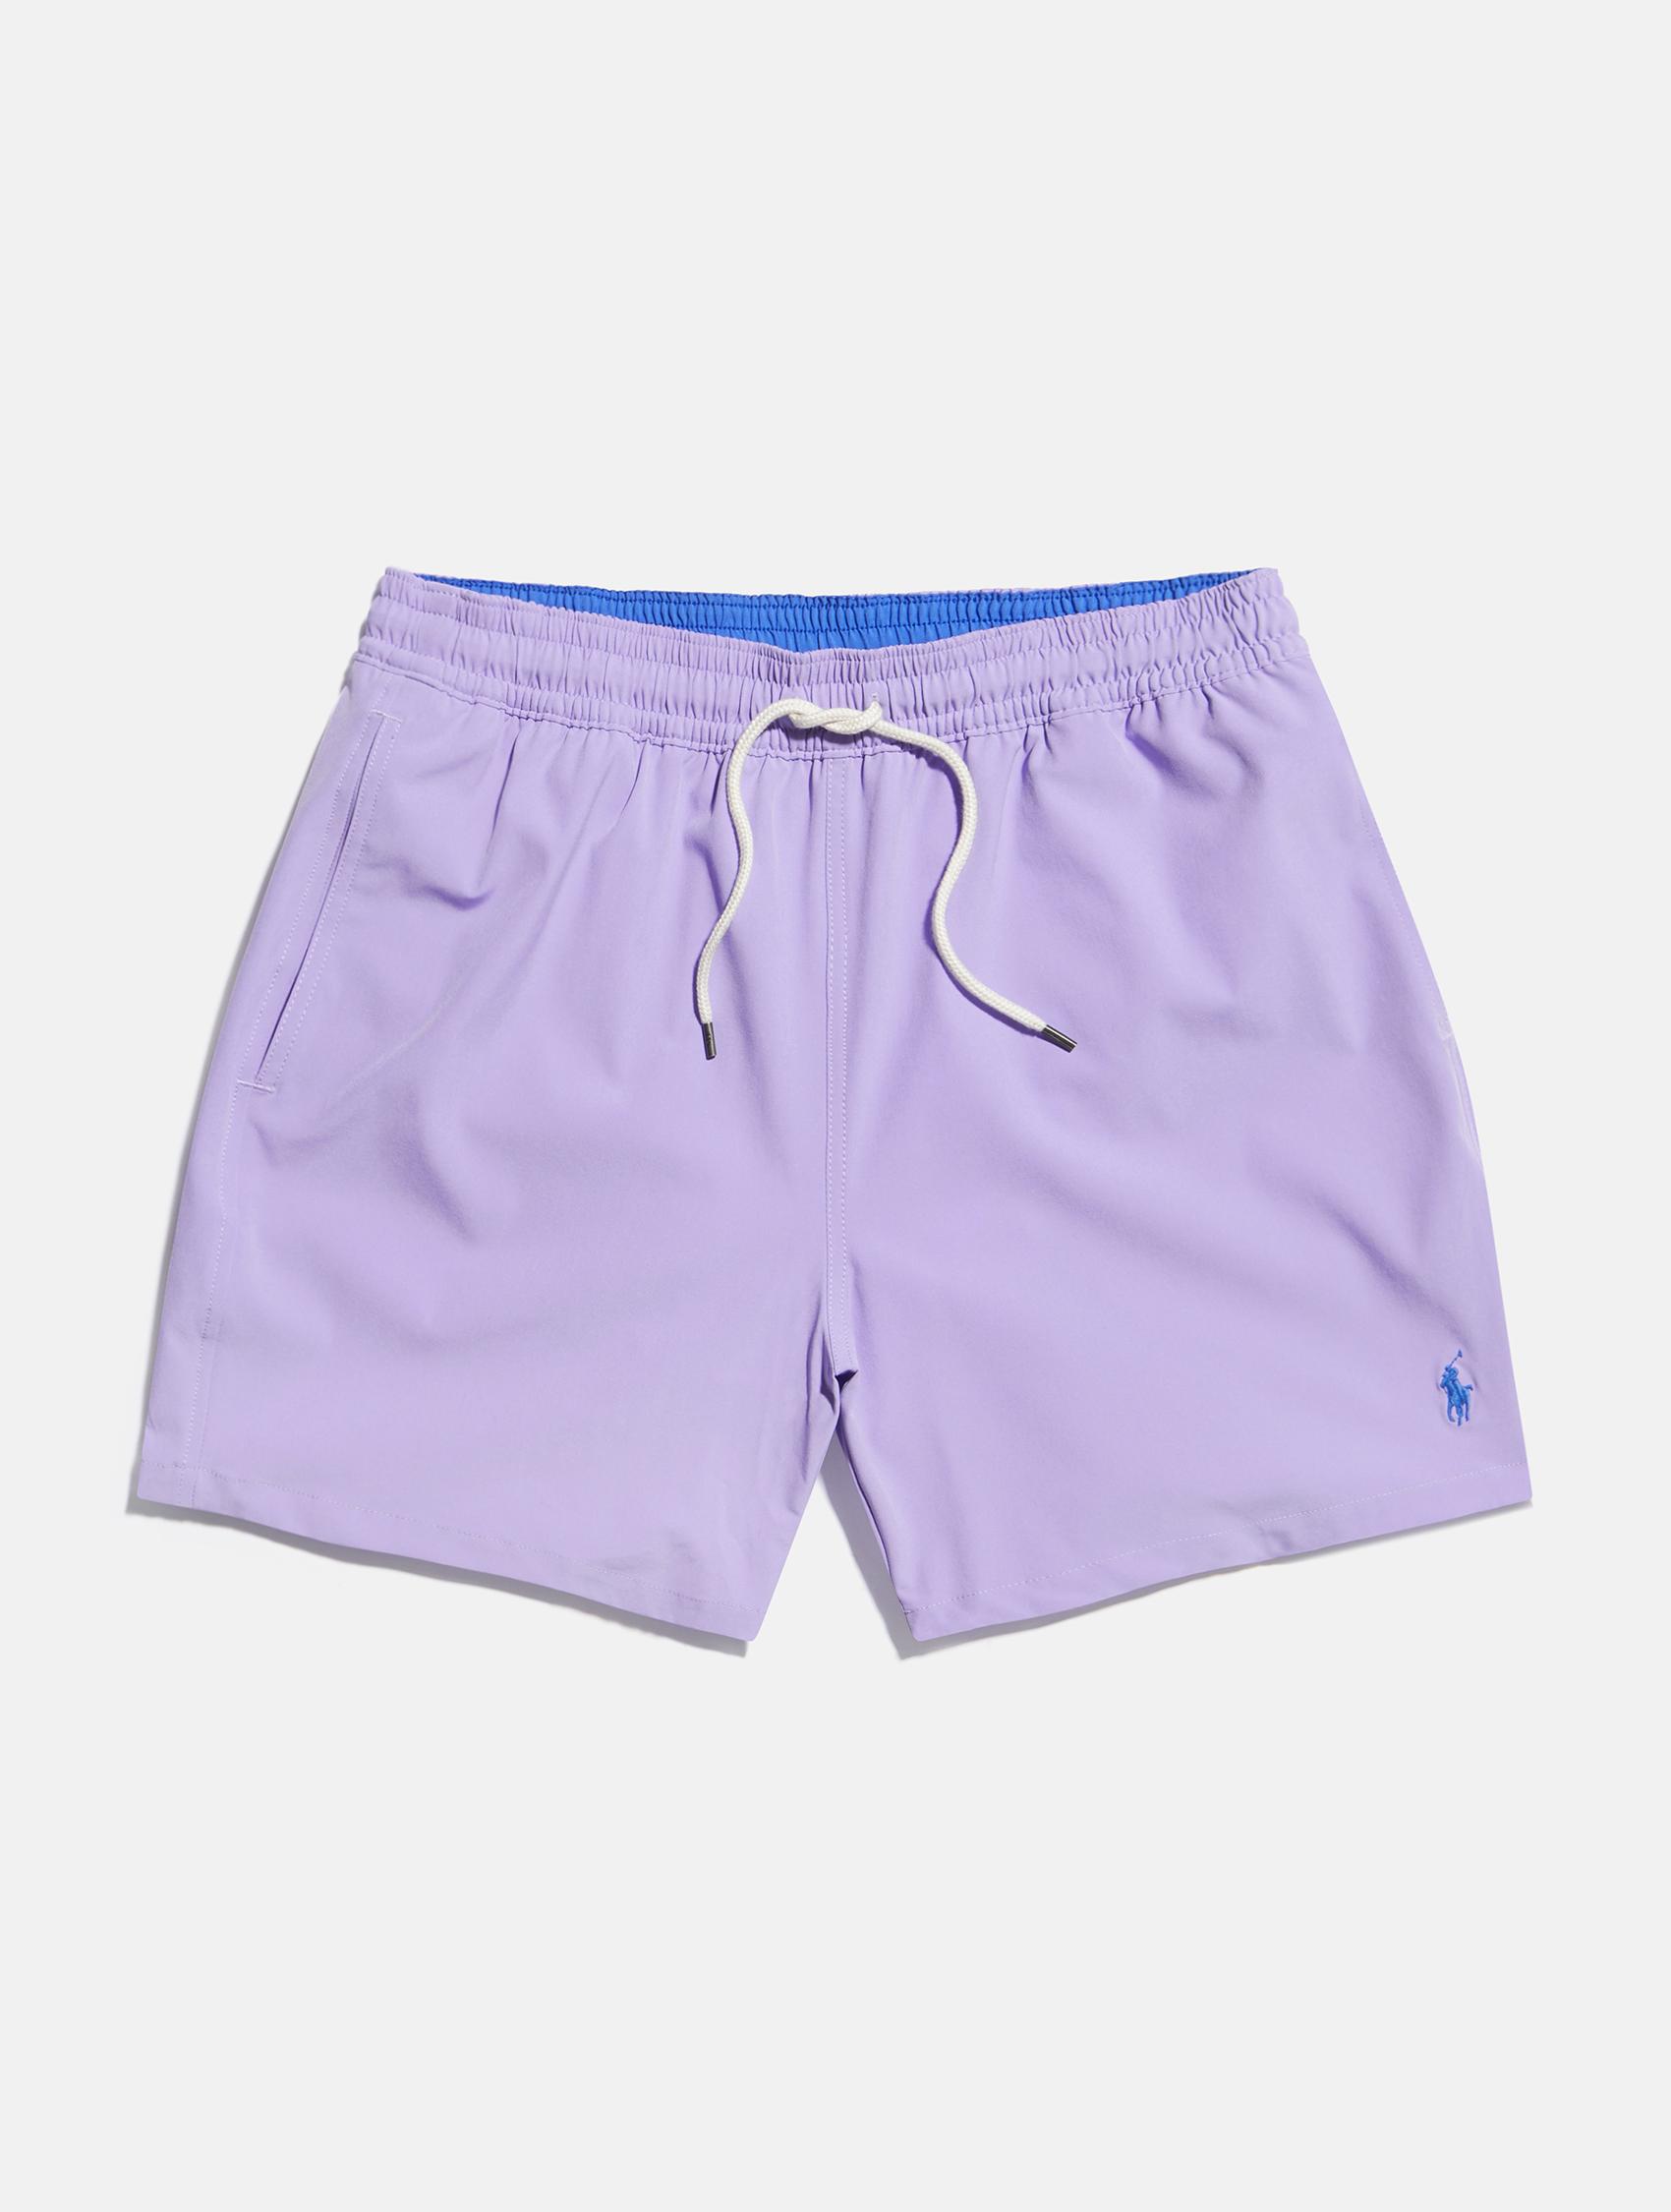 Light purple with blue detailing Ralph Lauren swimming shorts